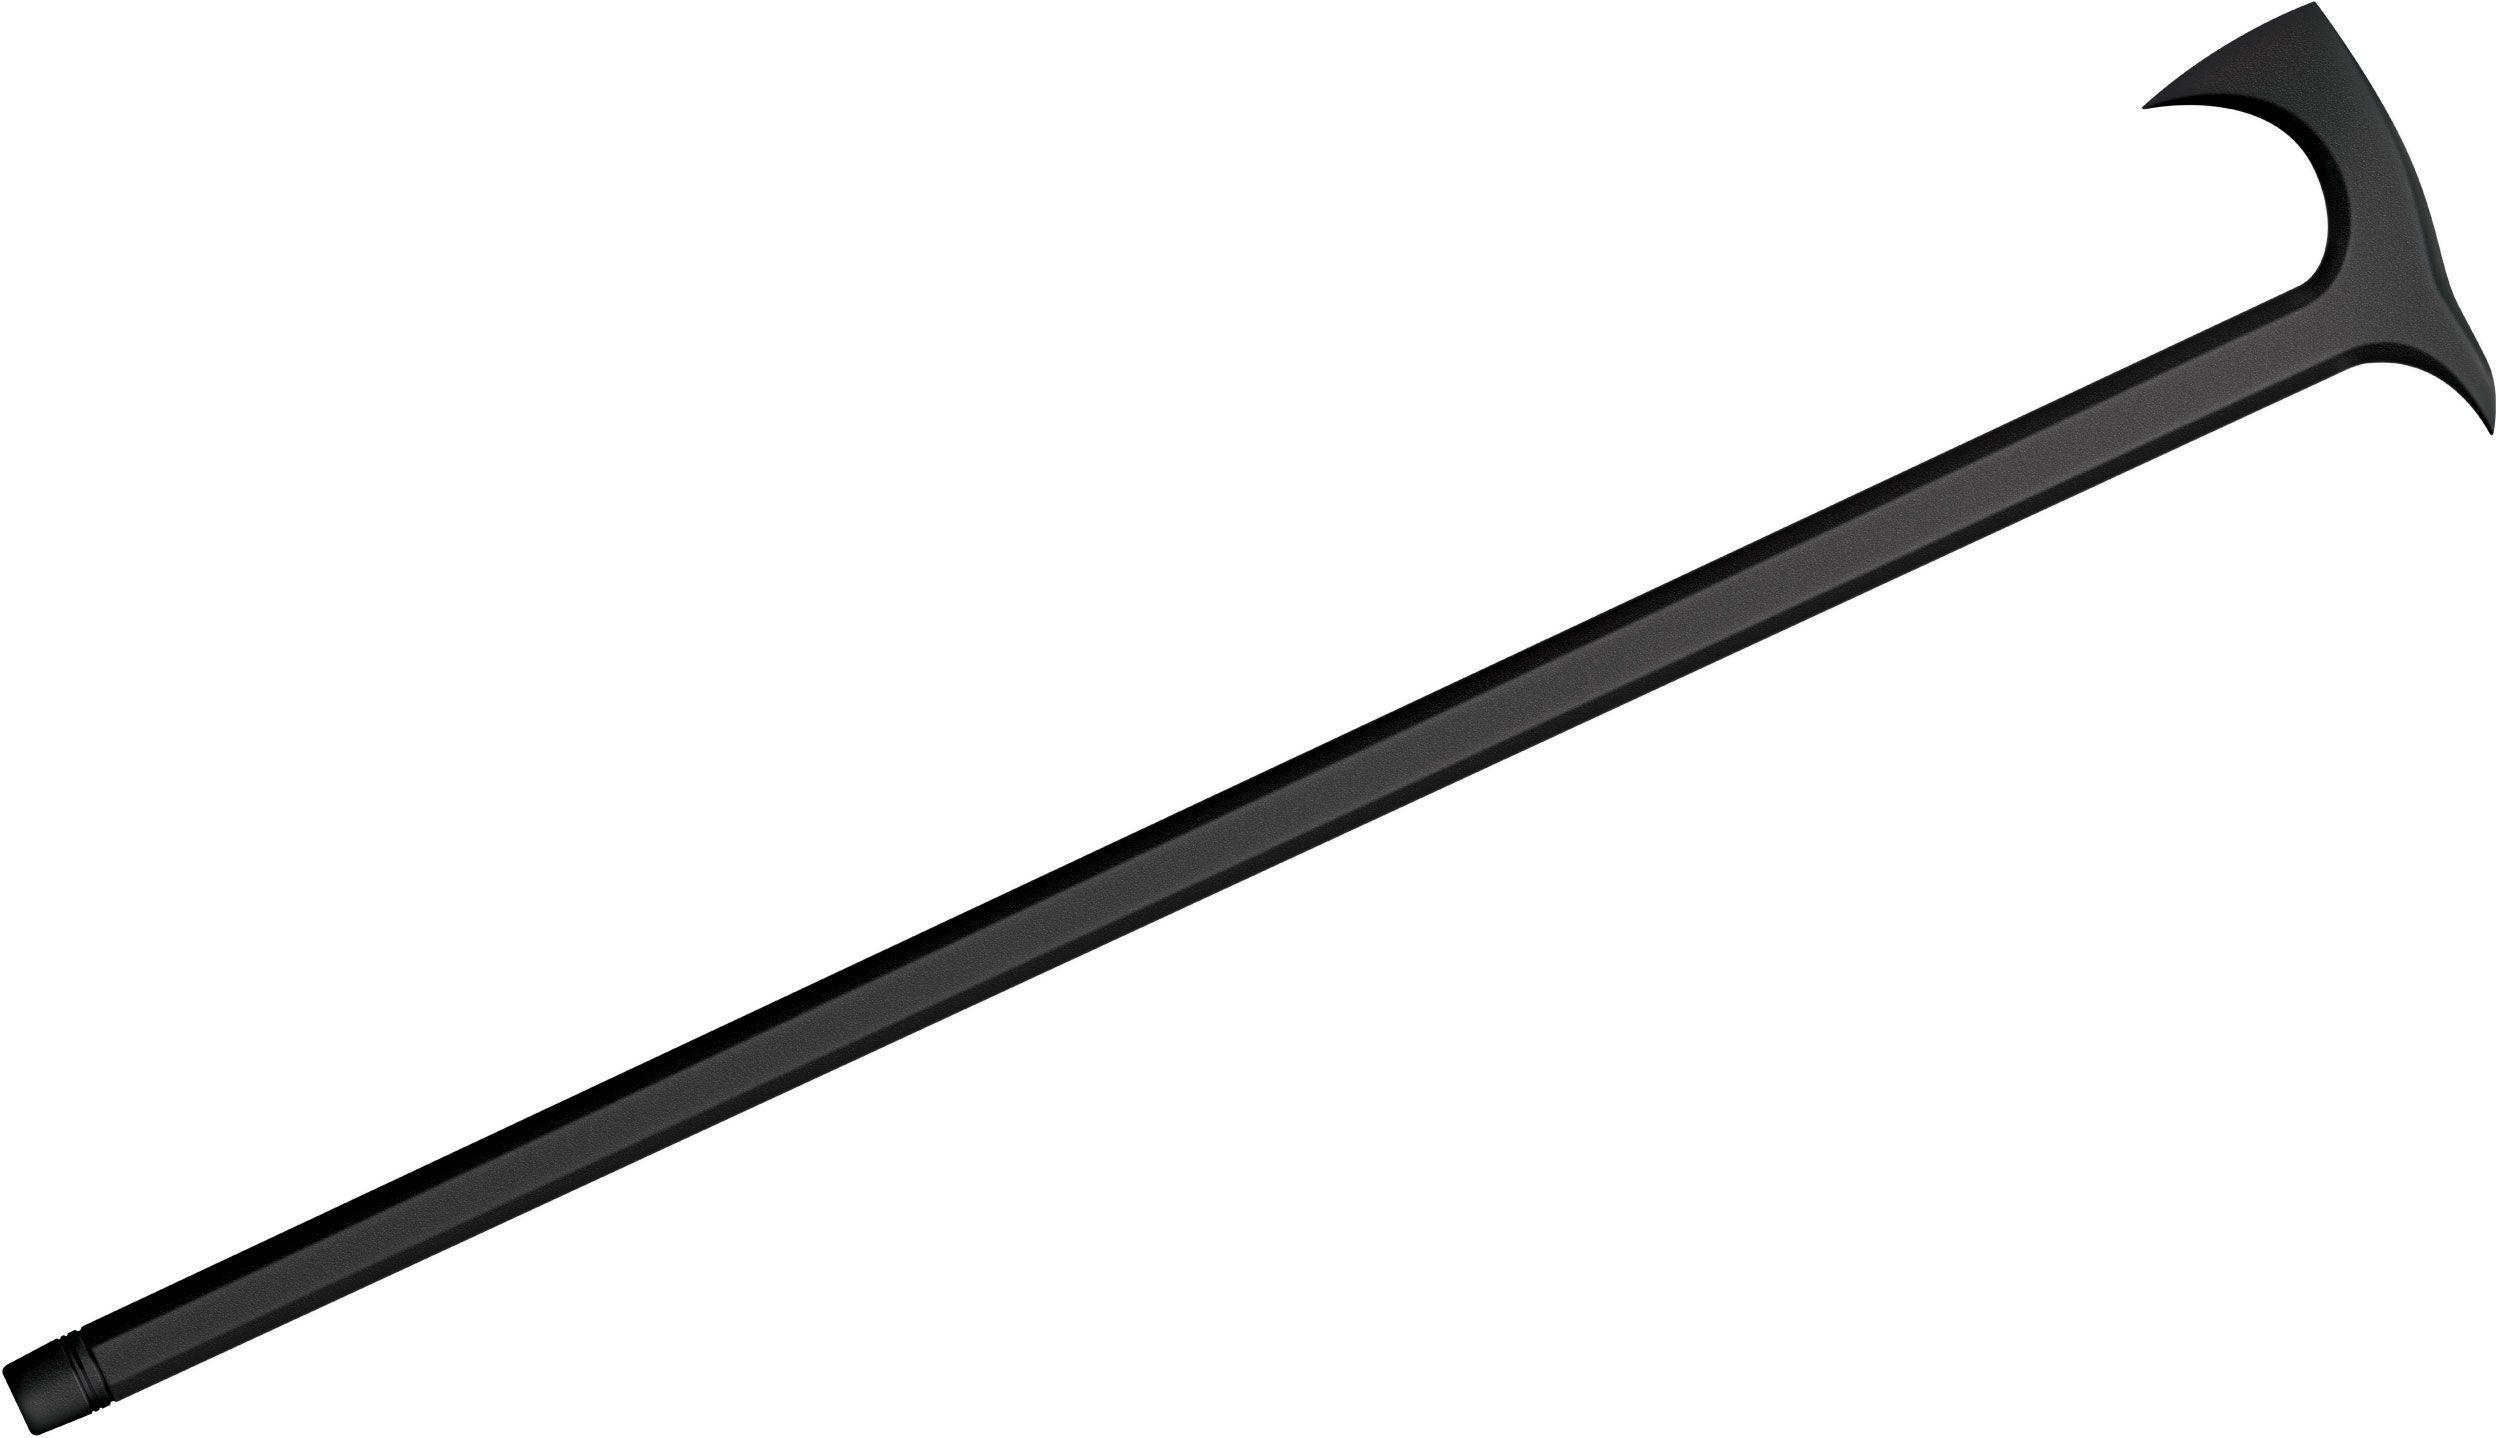 Cold Steel 91PCAXZ 38 inch Axe Head Cane